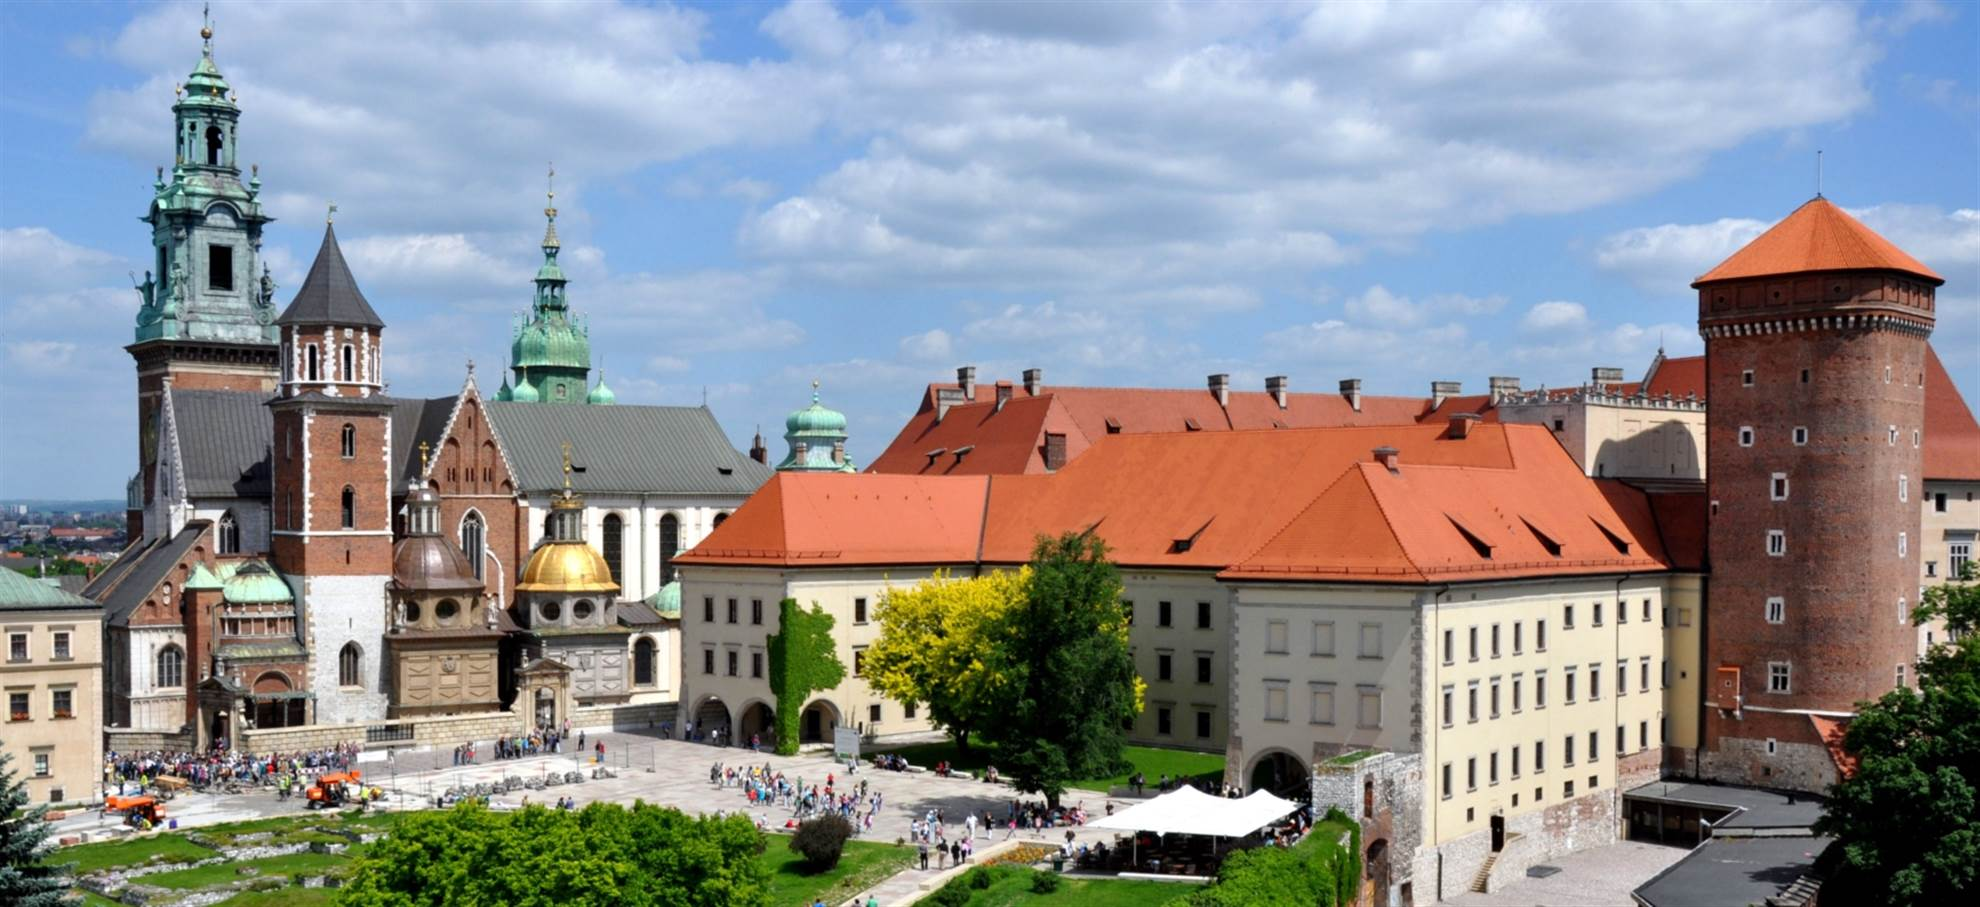 Wawel Castle guided tour